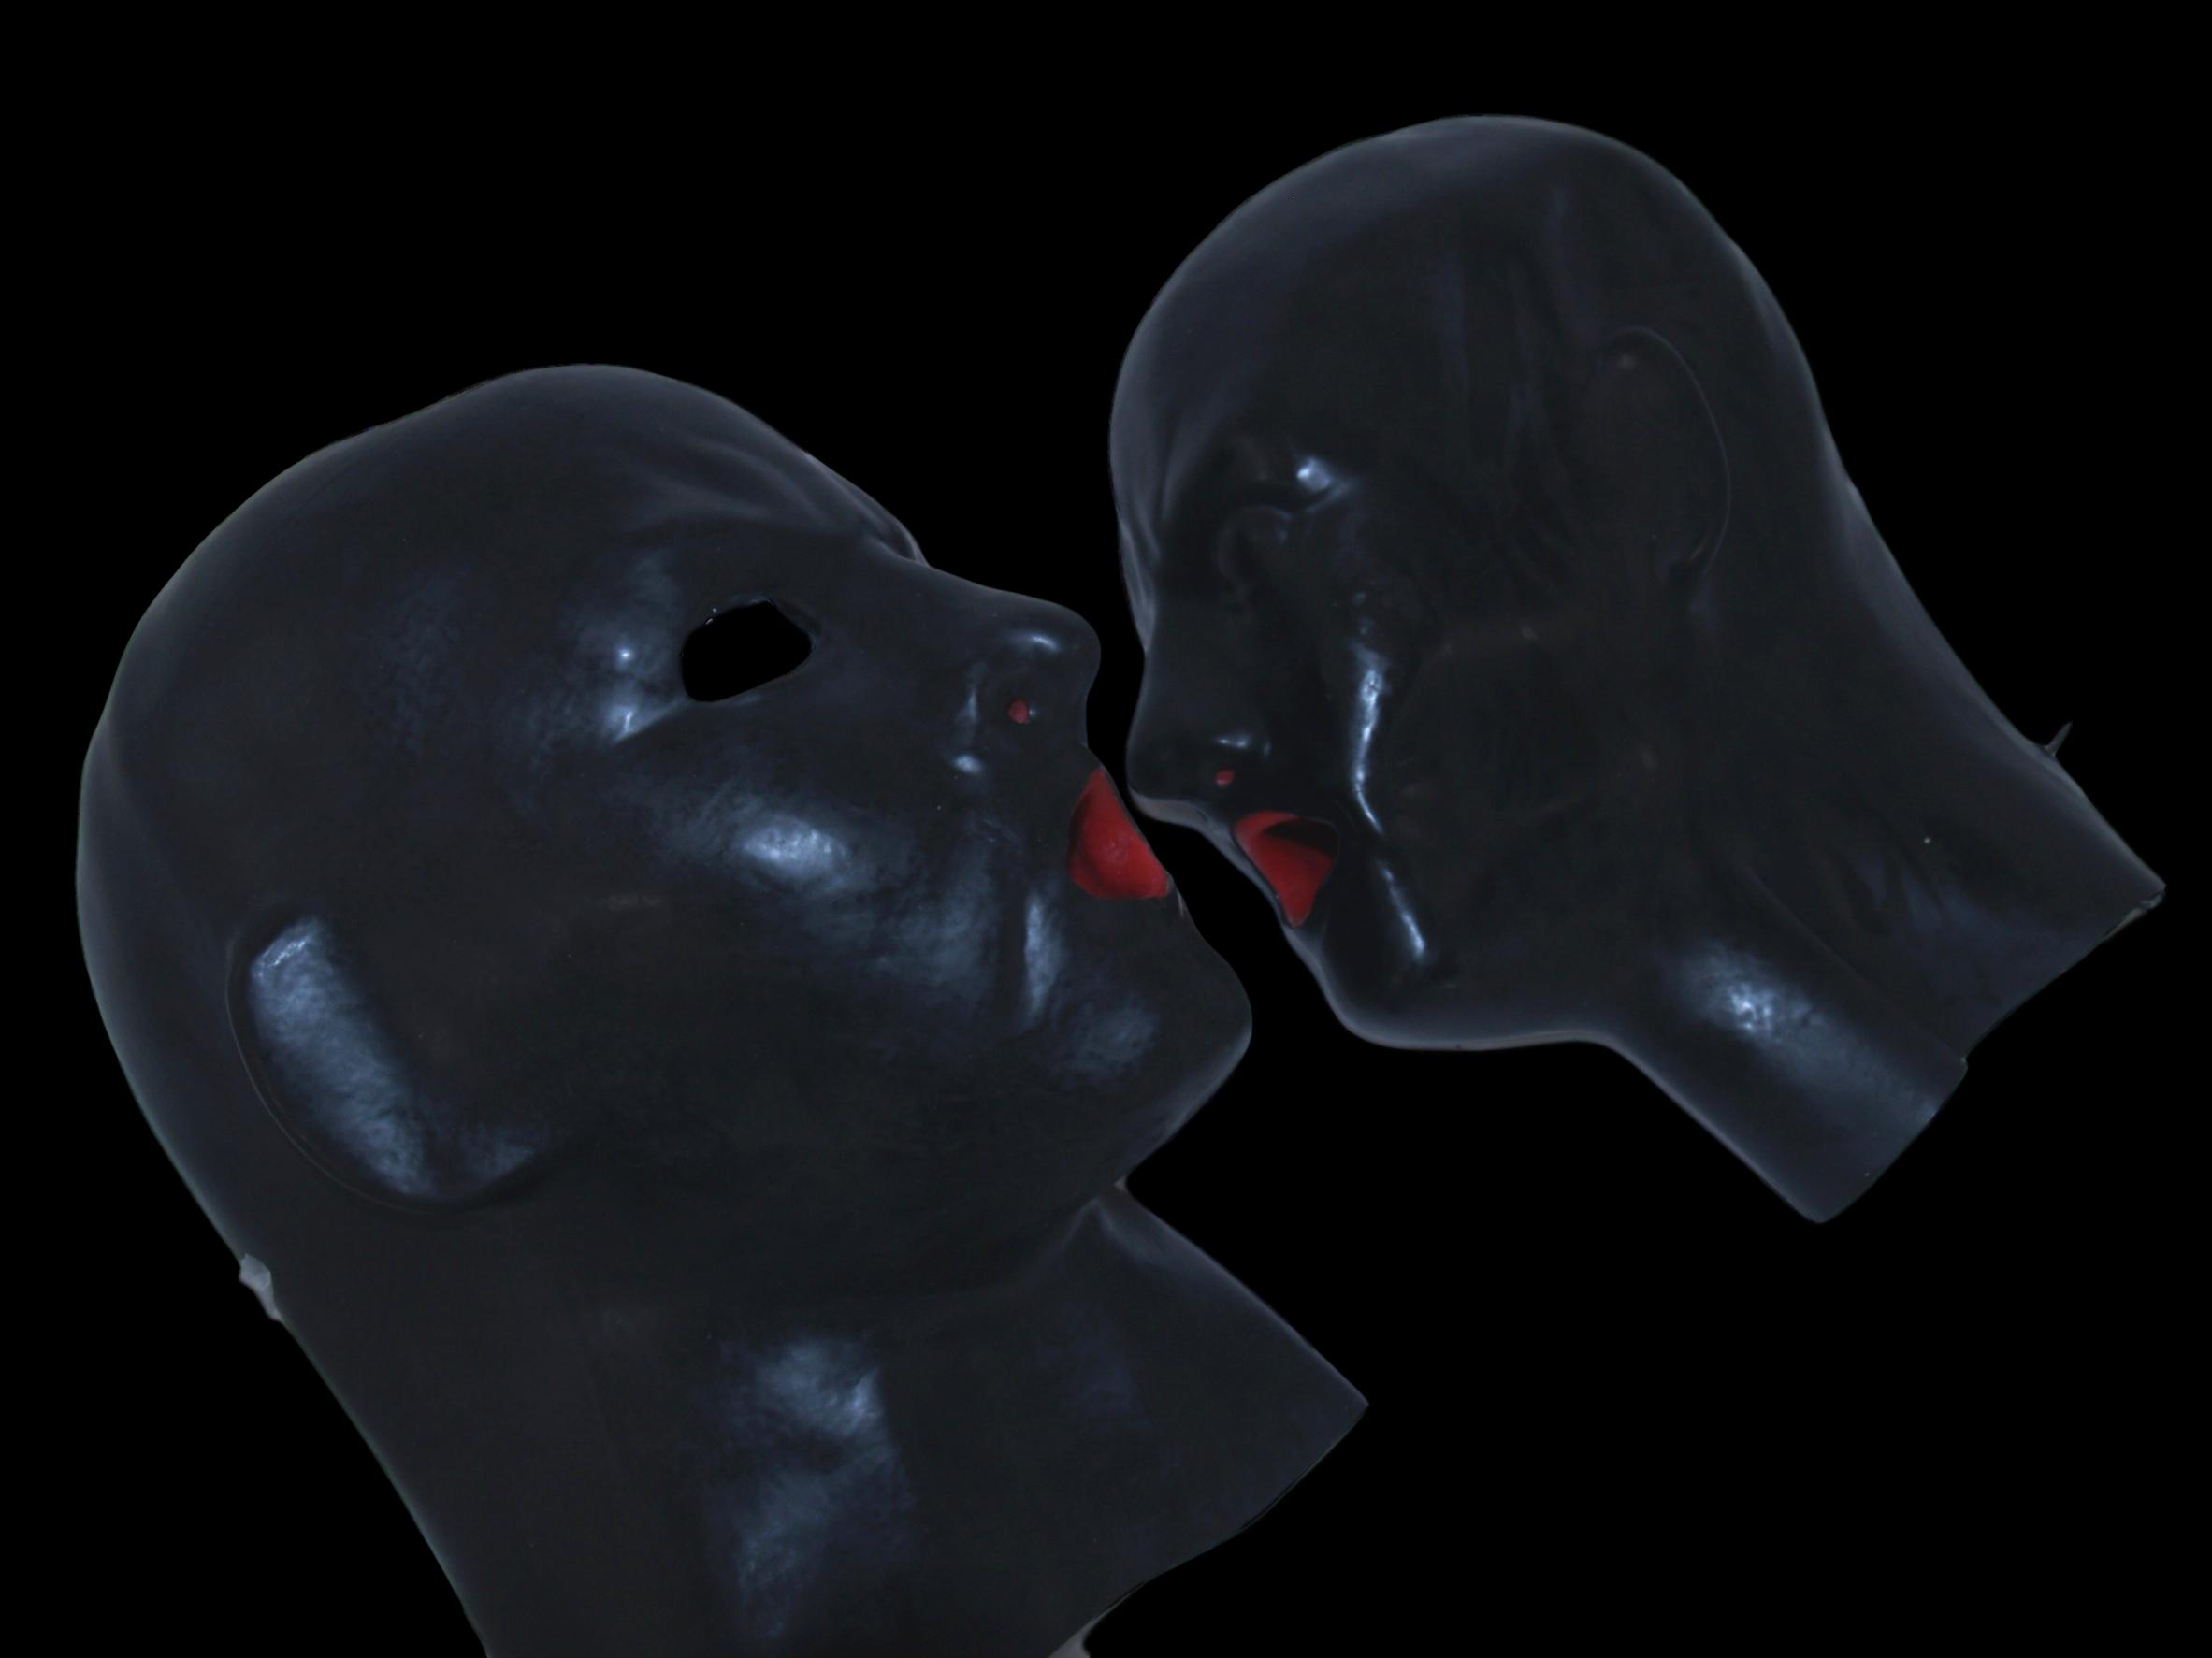 Anatomische Latexmaske mit Mundauskleidung - Fetishuniverse